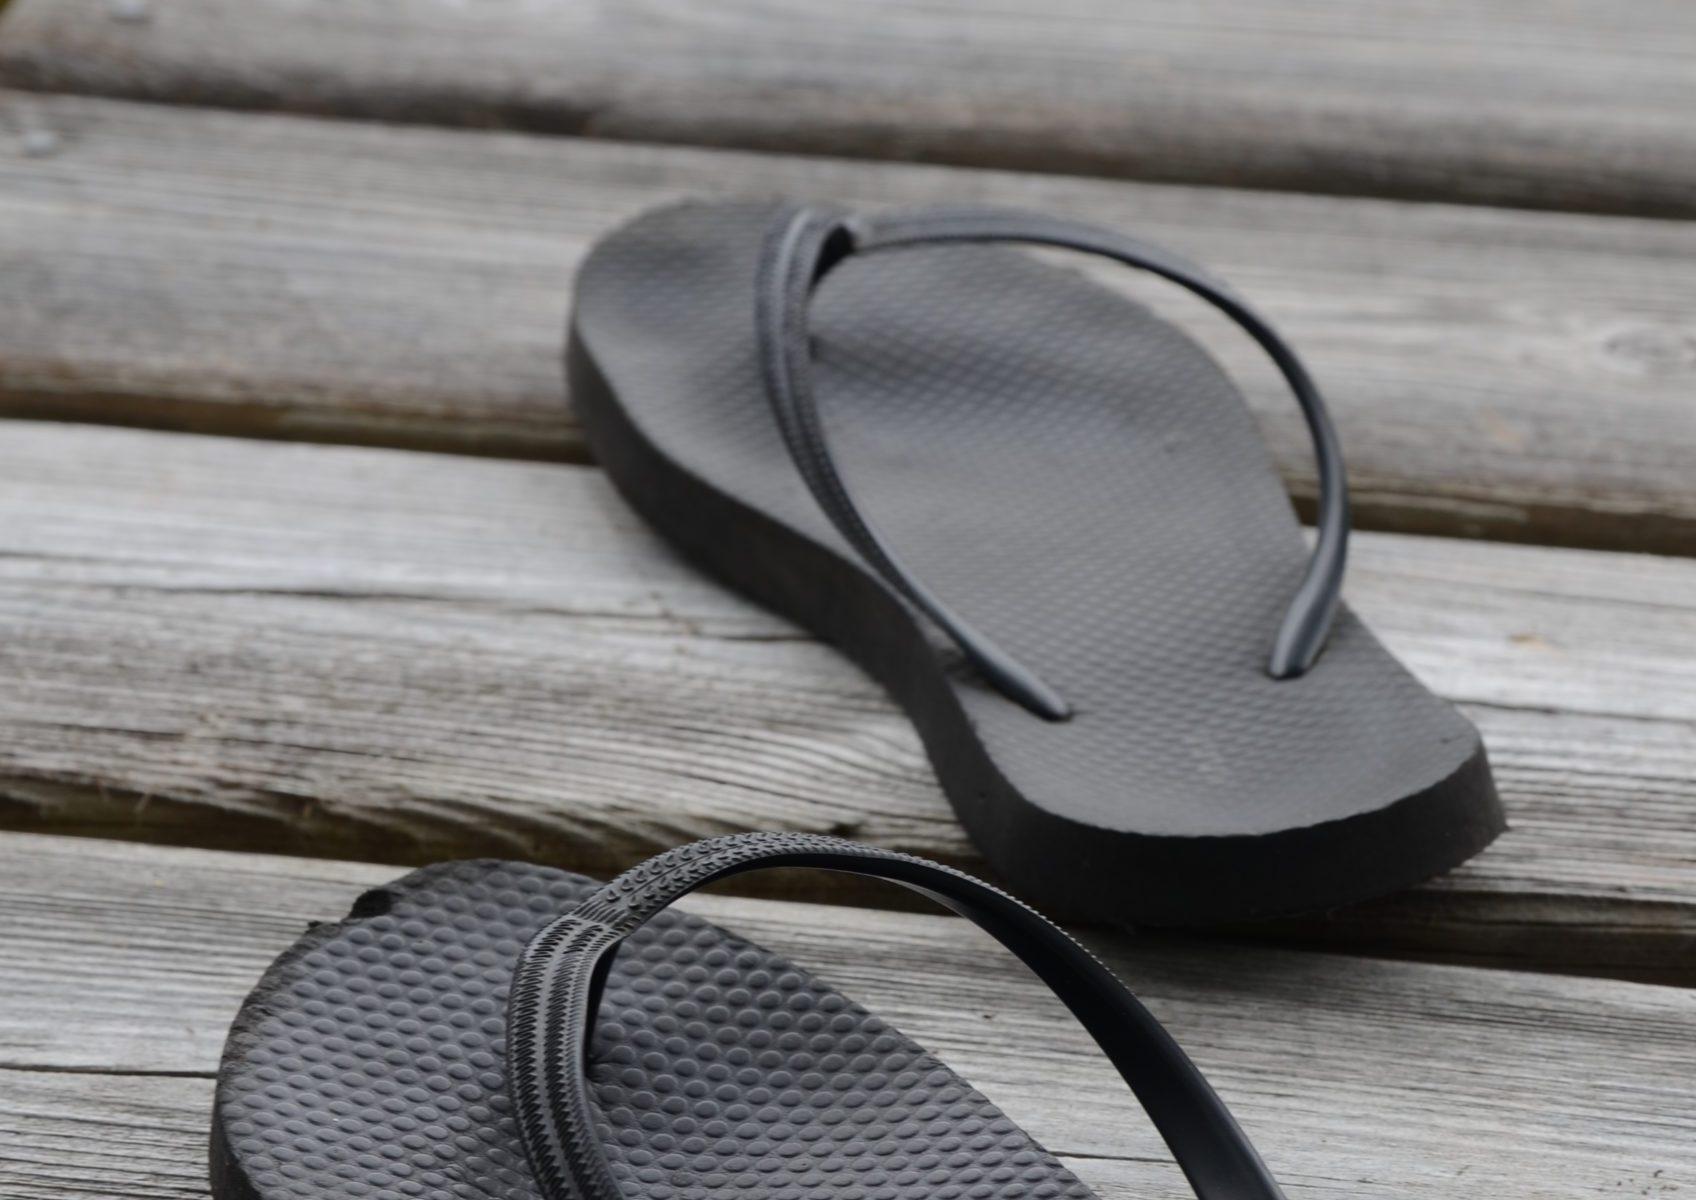 Flip flops on dock